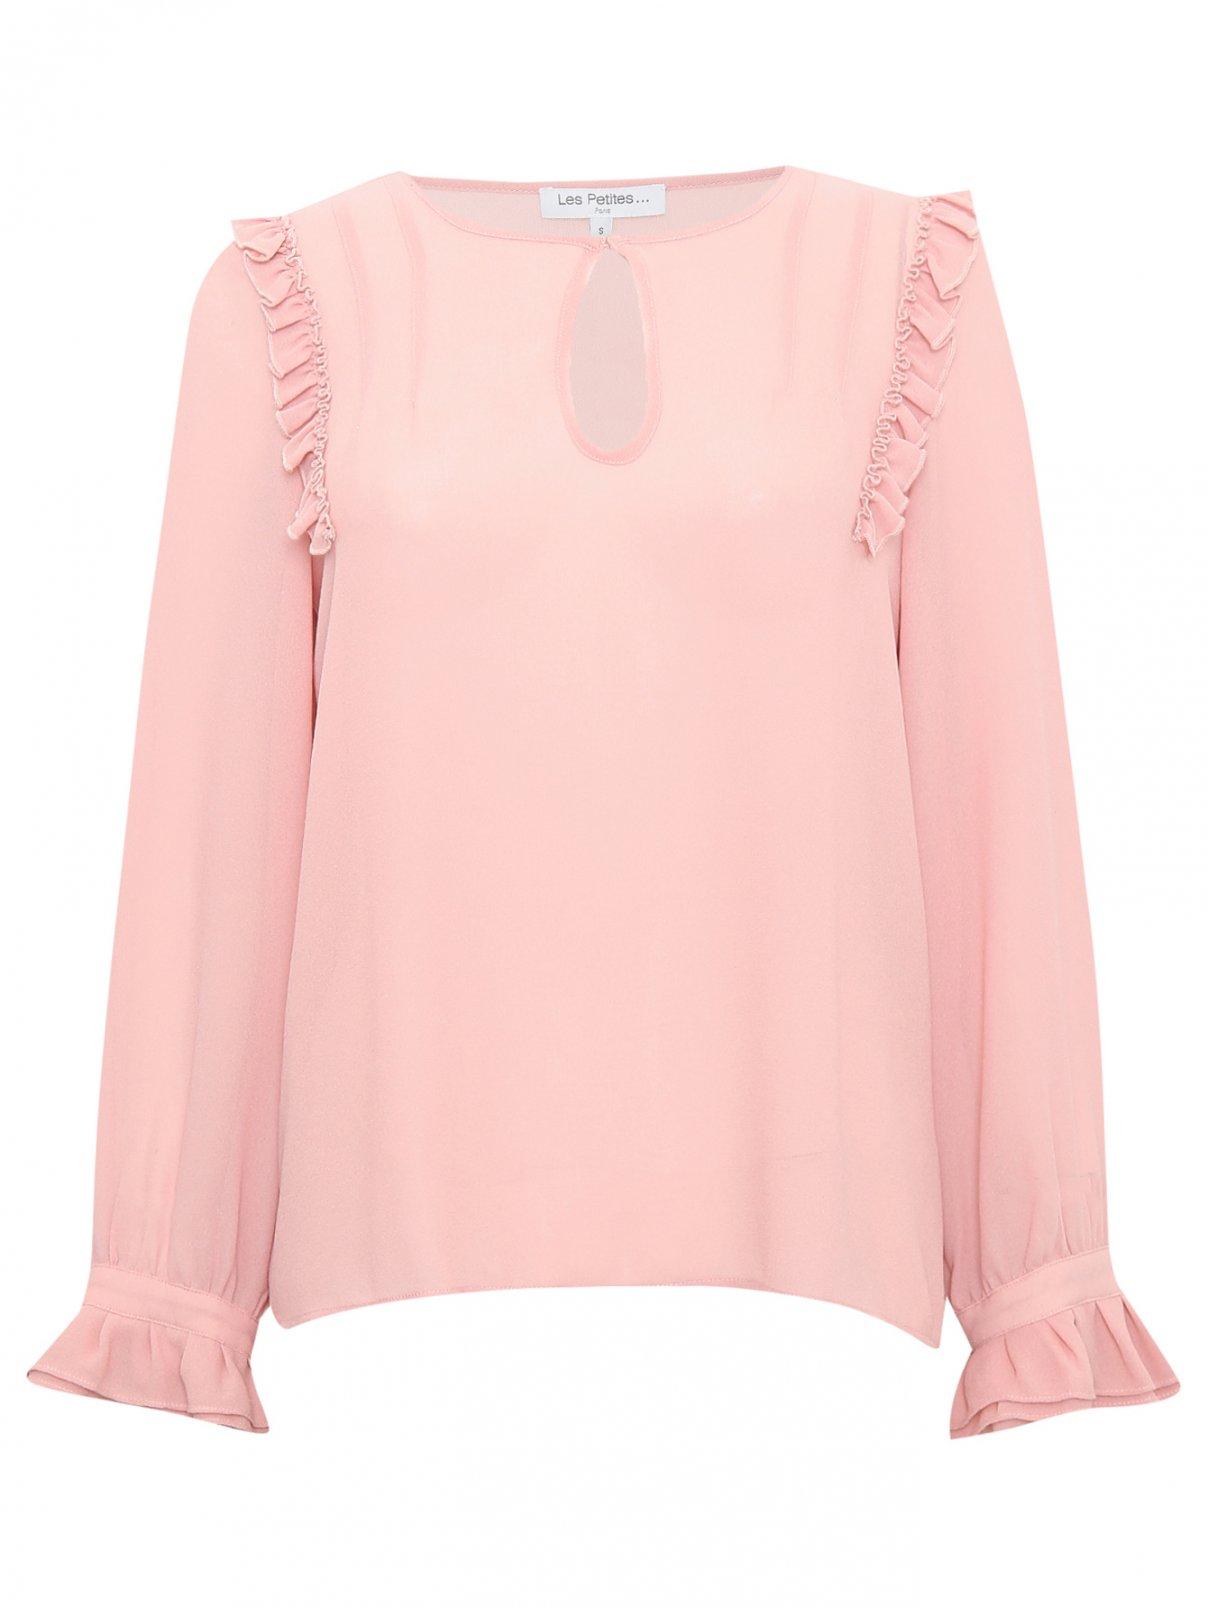 Блуза с декоративными рюшами Les Petites...  –  Общий вид